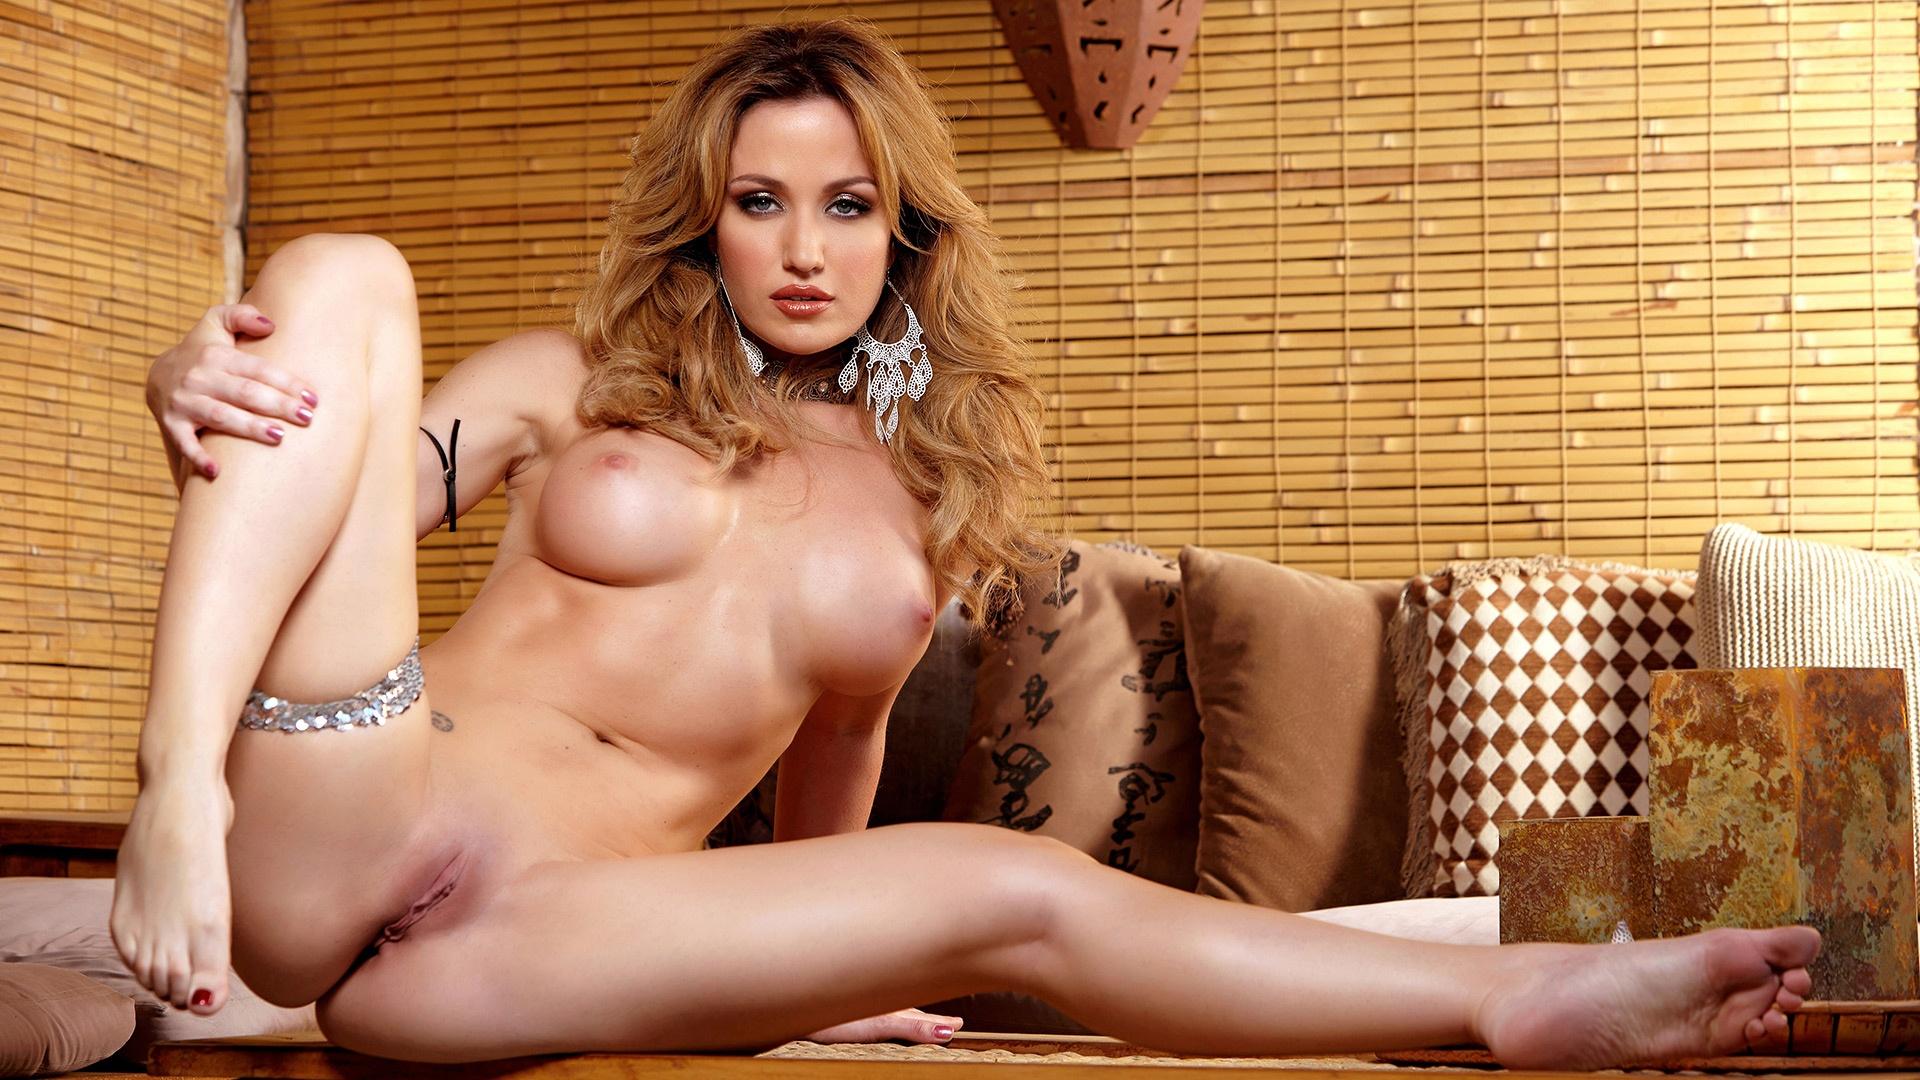 nude beautiful girl doing sex